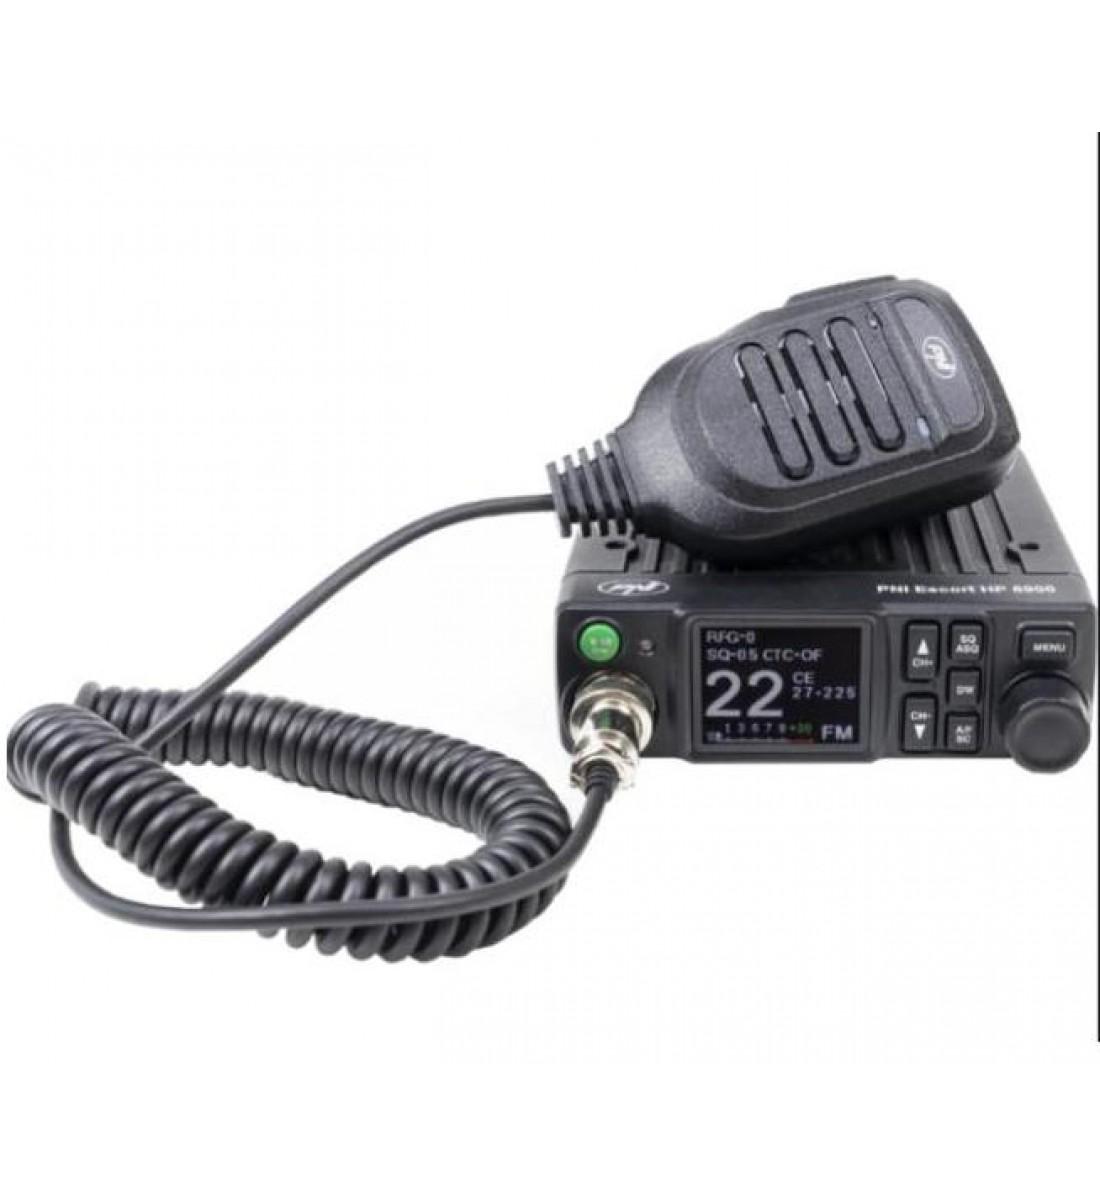 Statie radio CB PNI Escort HP 8900